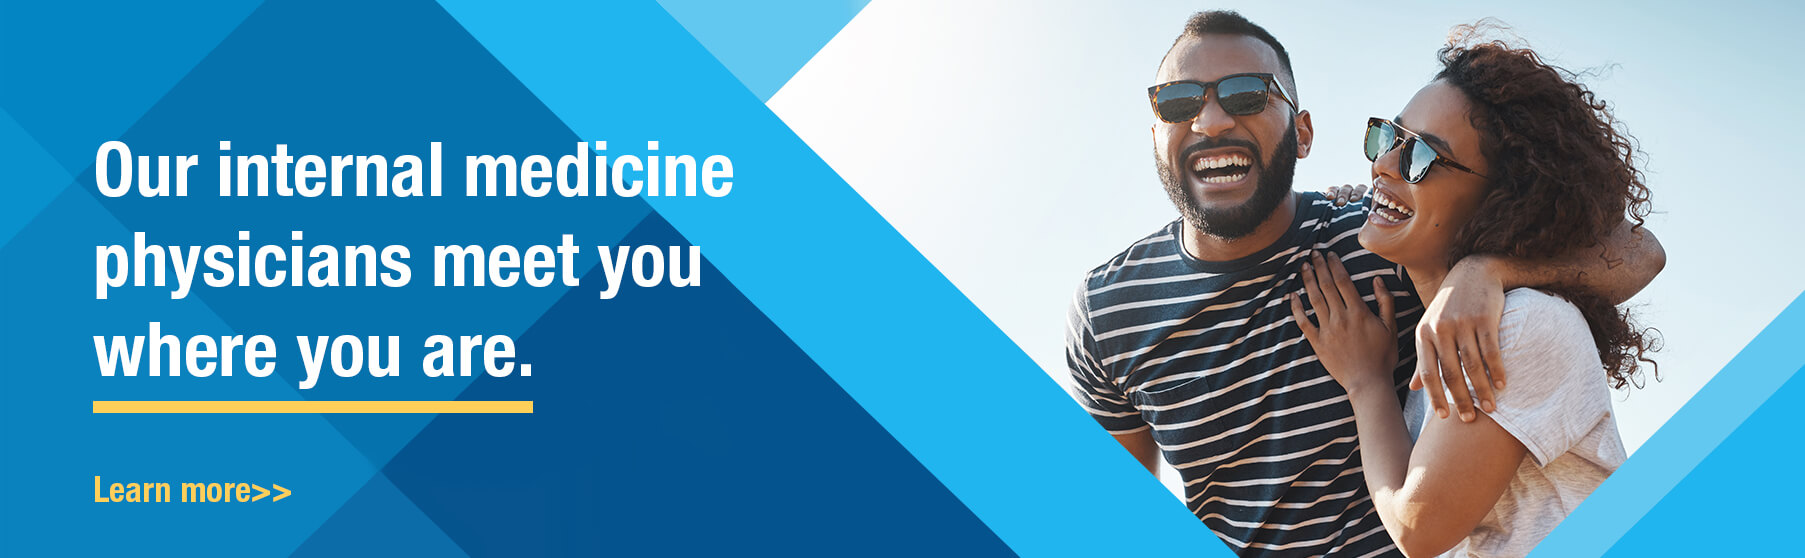 Internal Medicine Physicians Meet You Where You Are